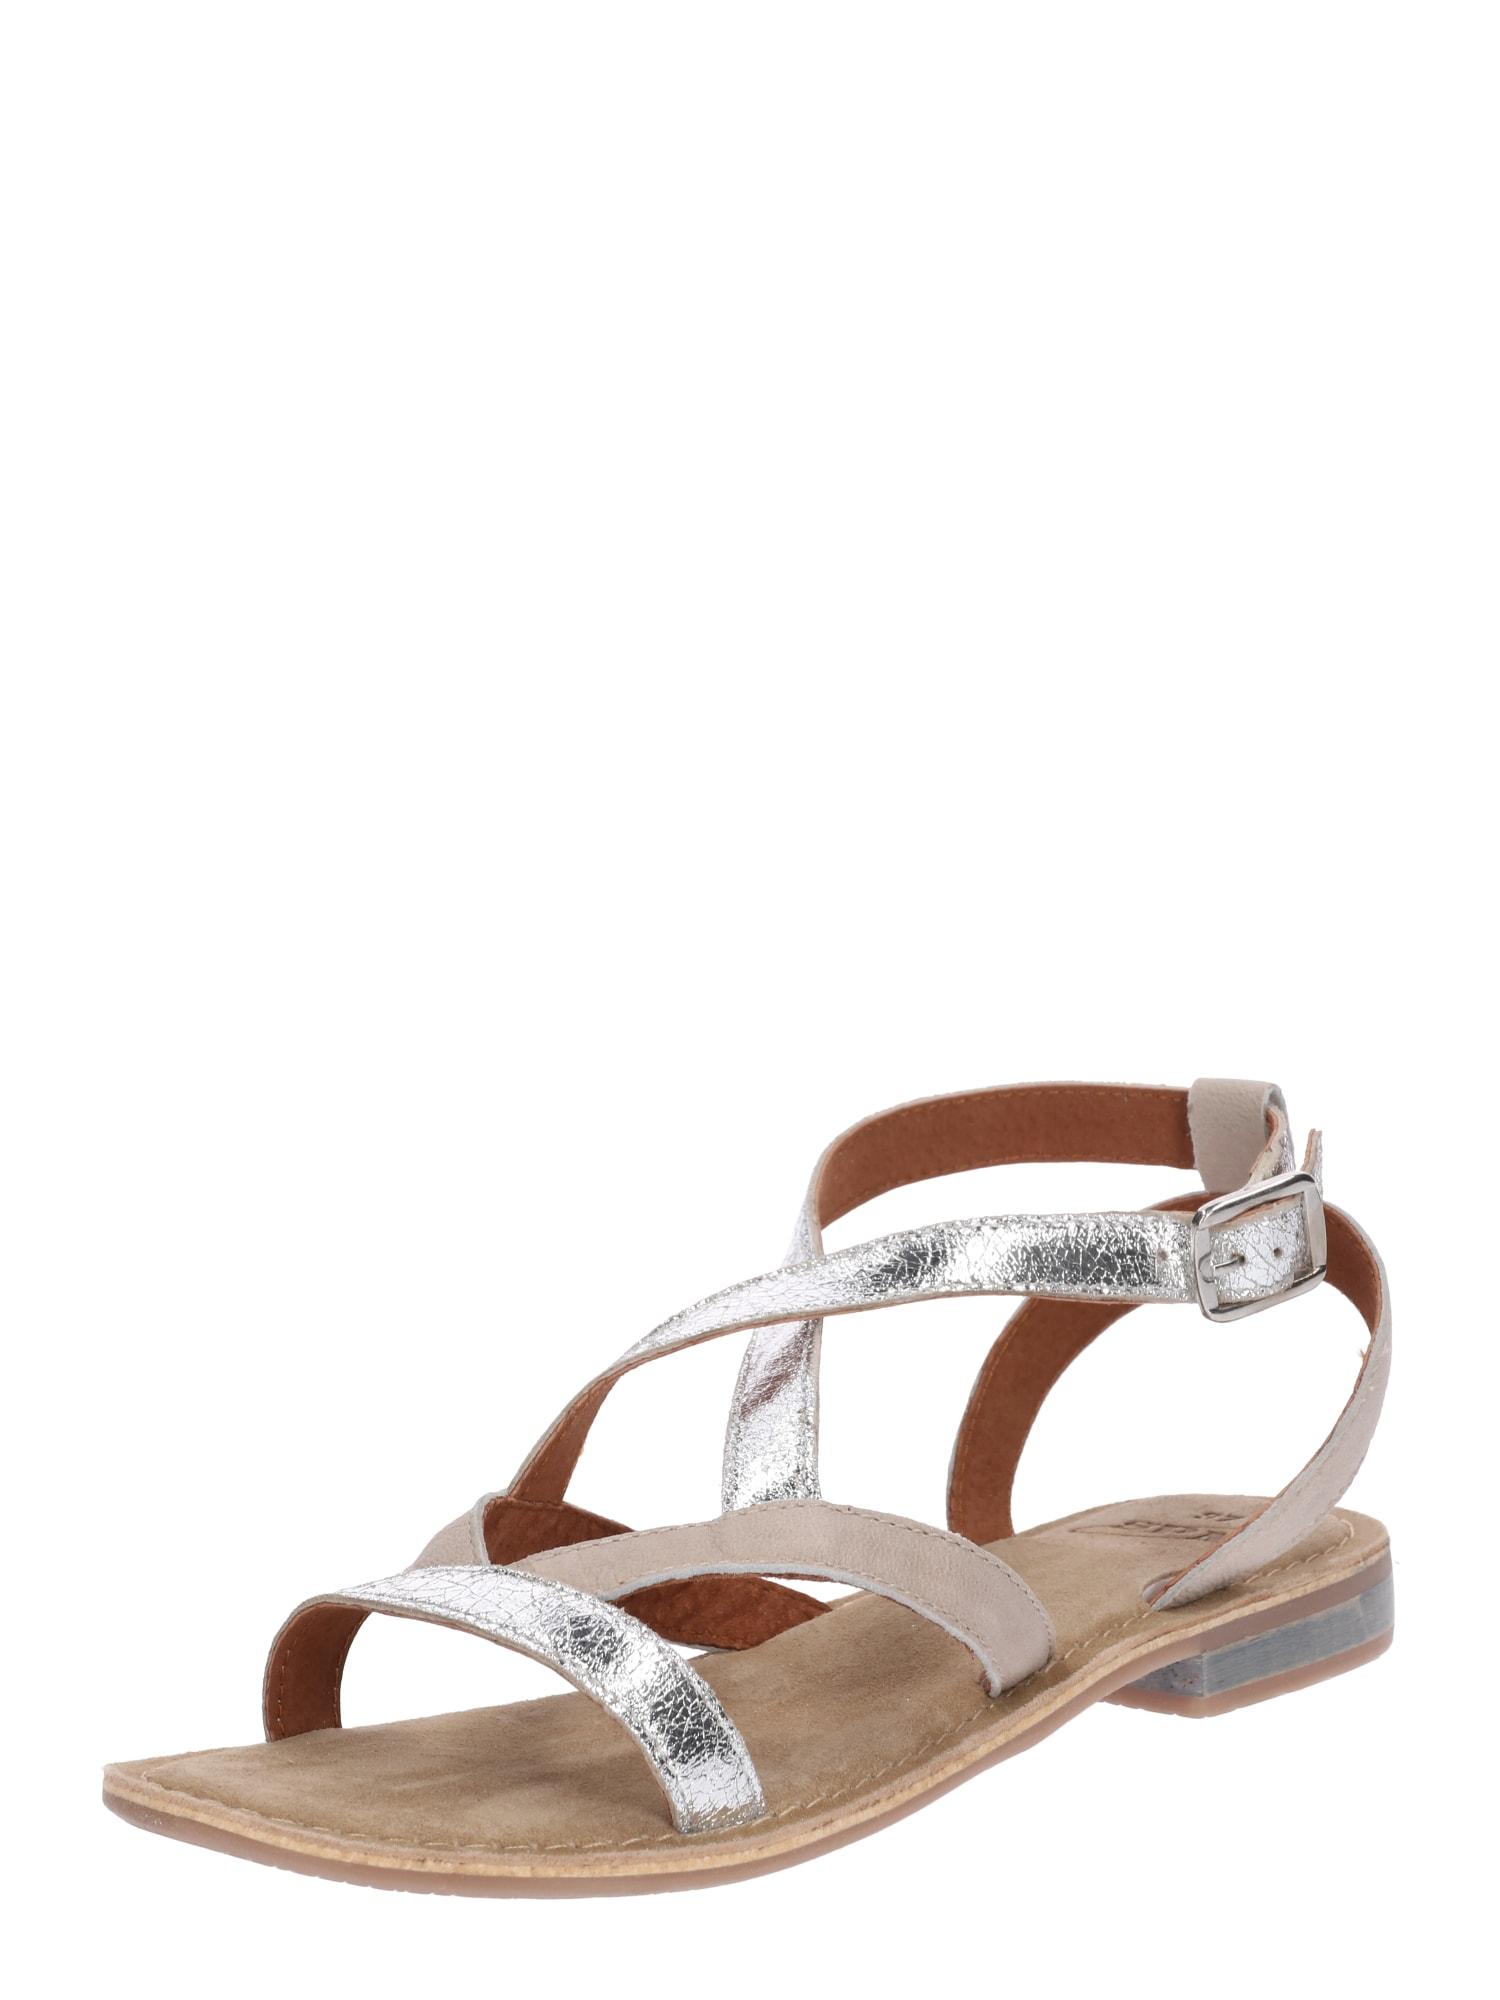 Sandály Dazzle stříbrná SPM